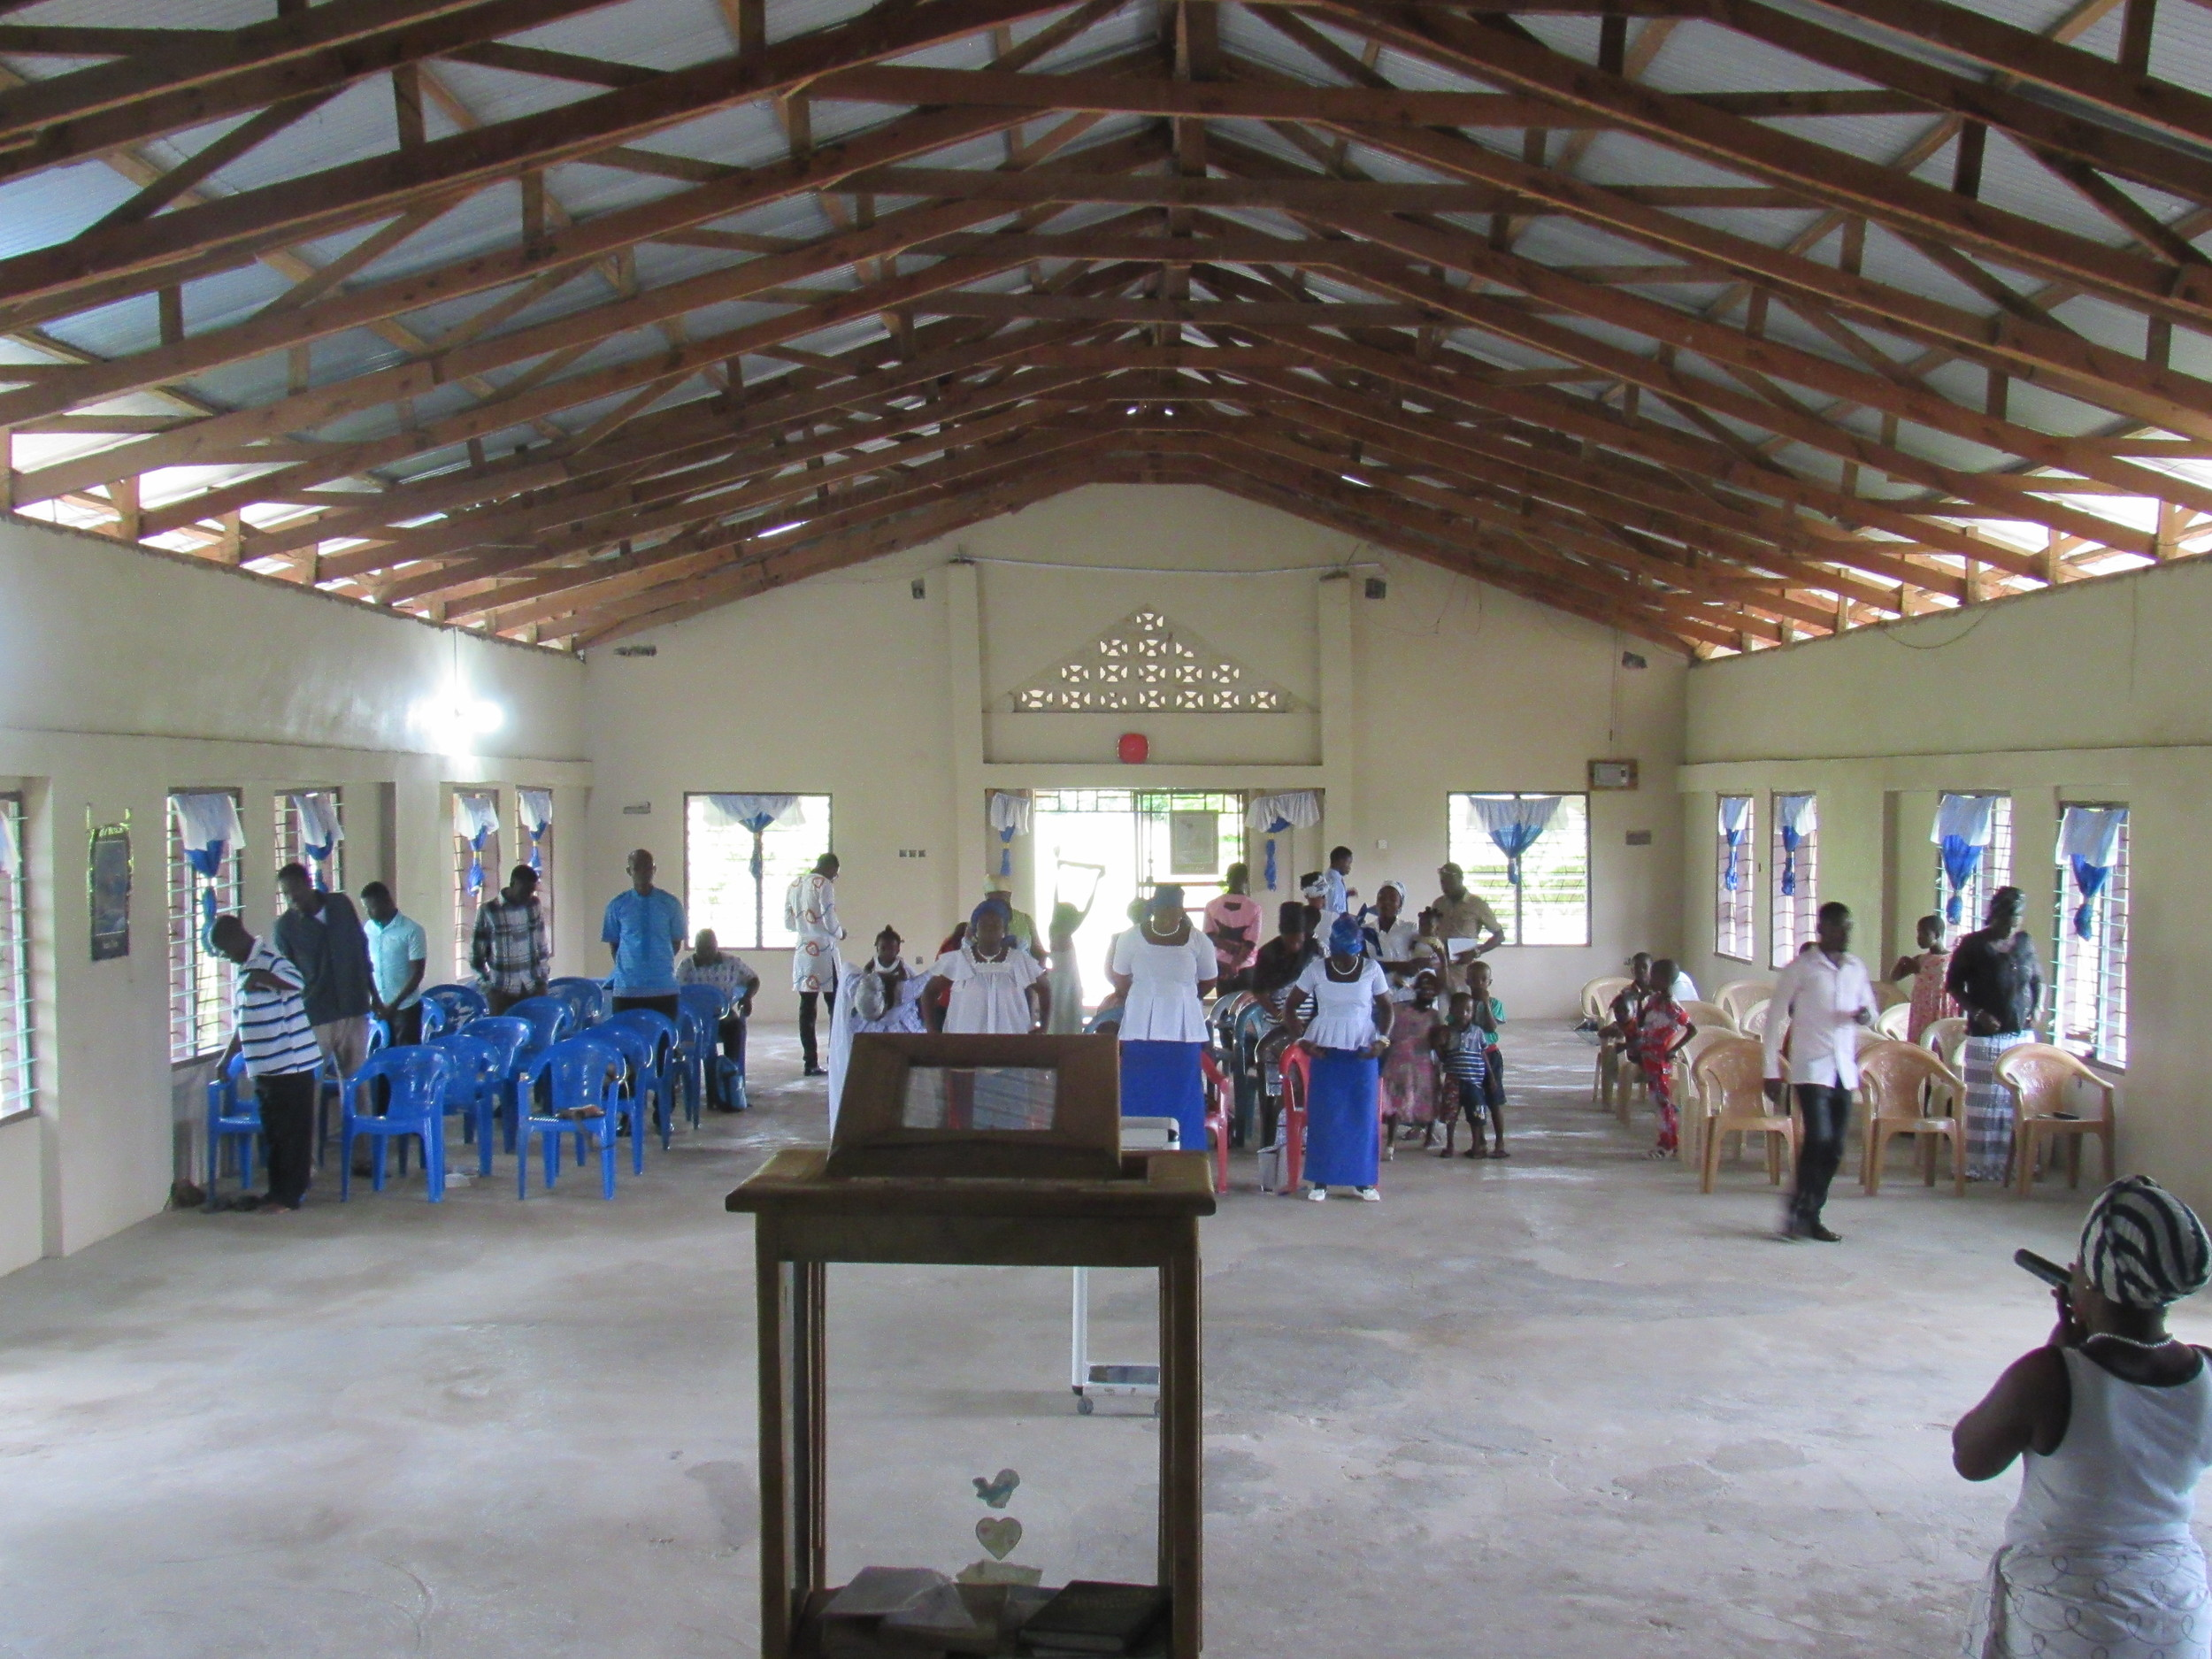 This is Ebeneezer Missionary Baptist Church on Sunday Morning.